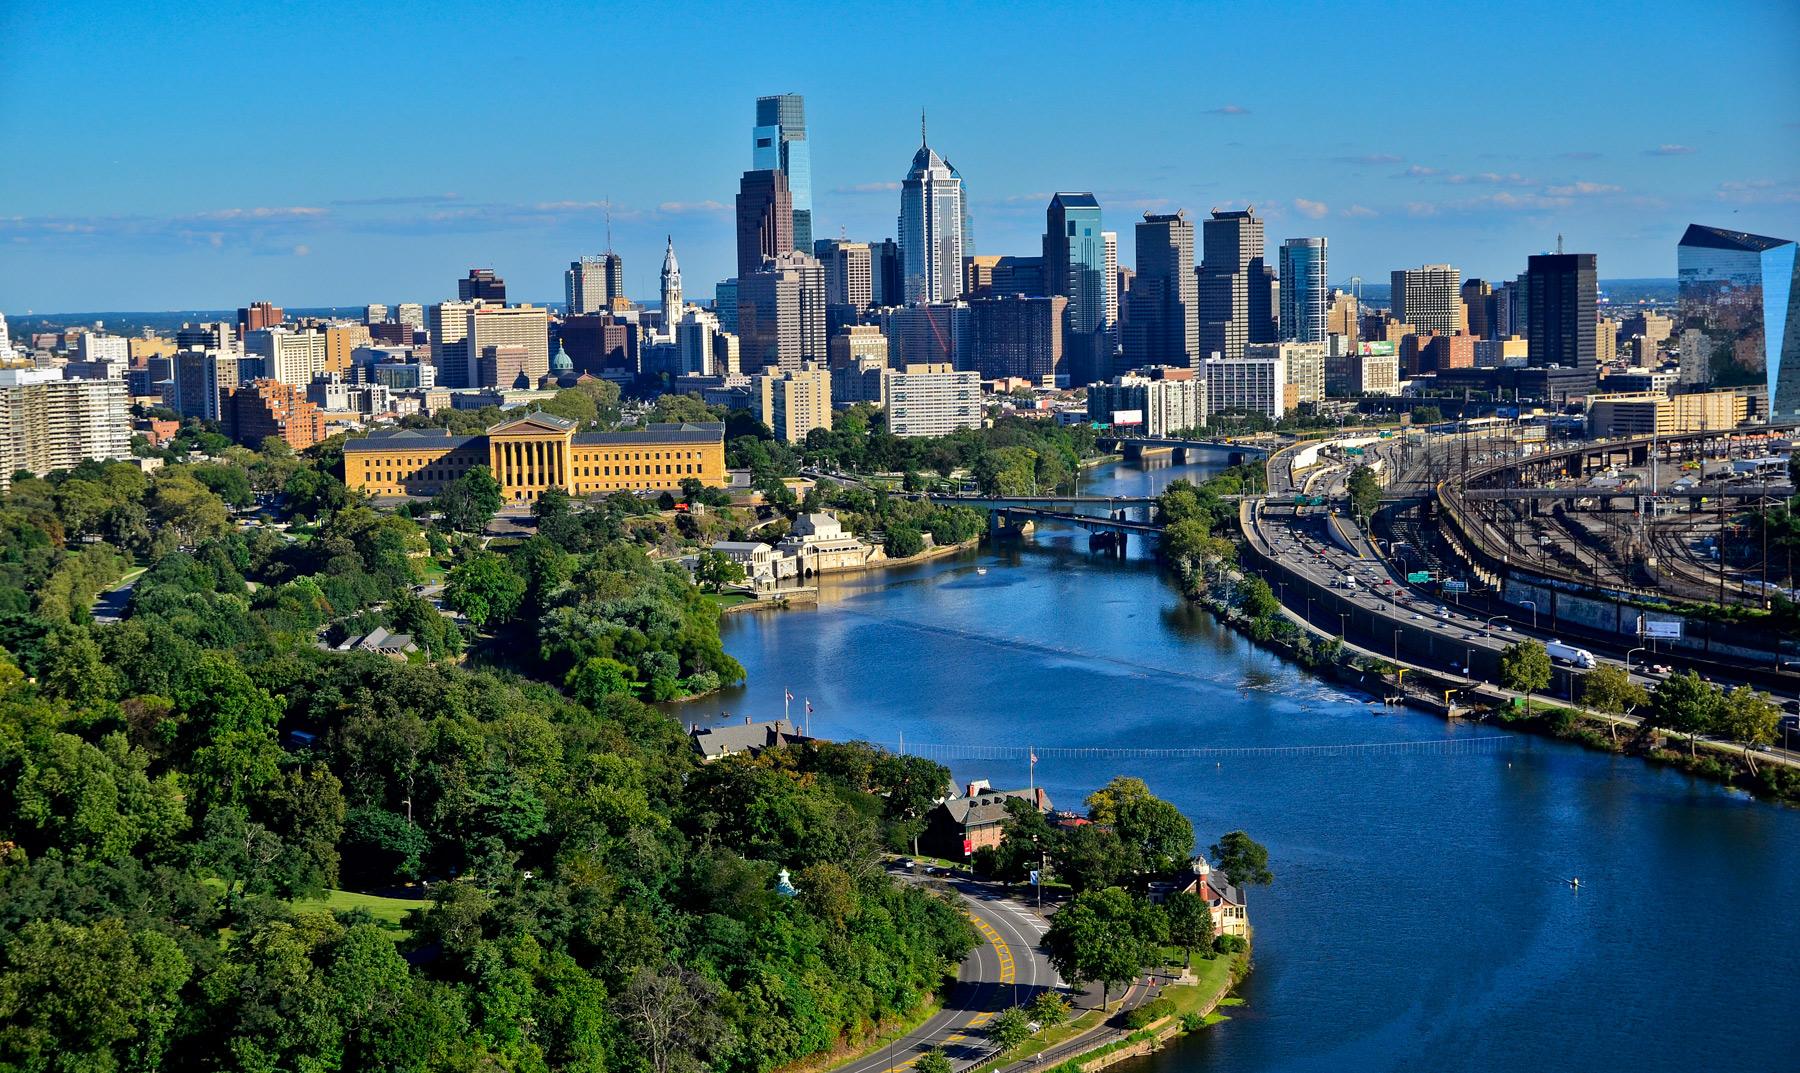 philadelphia-skyline-background-image2-1800vp